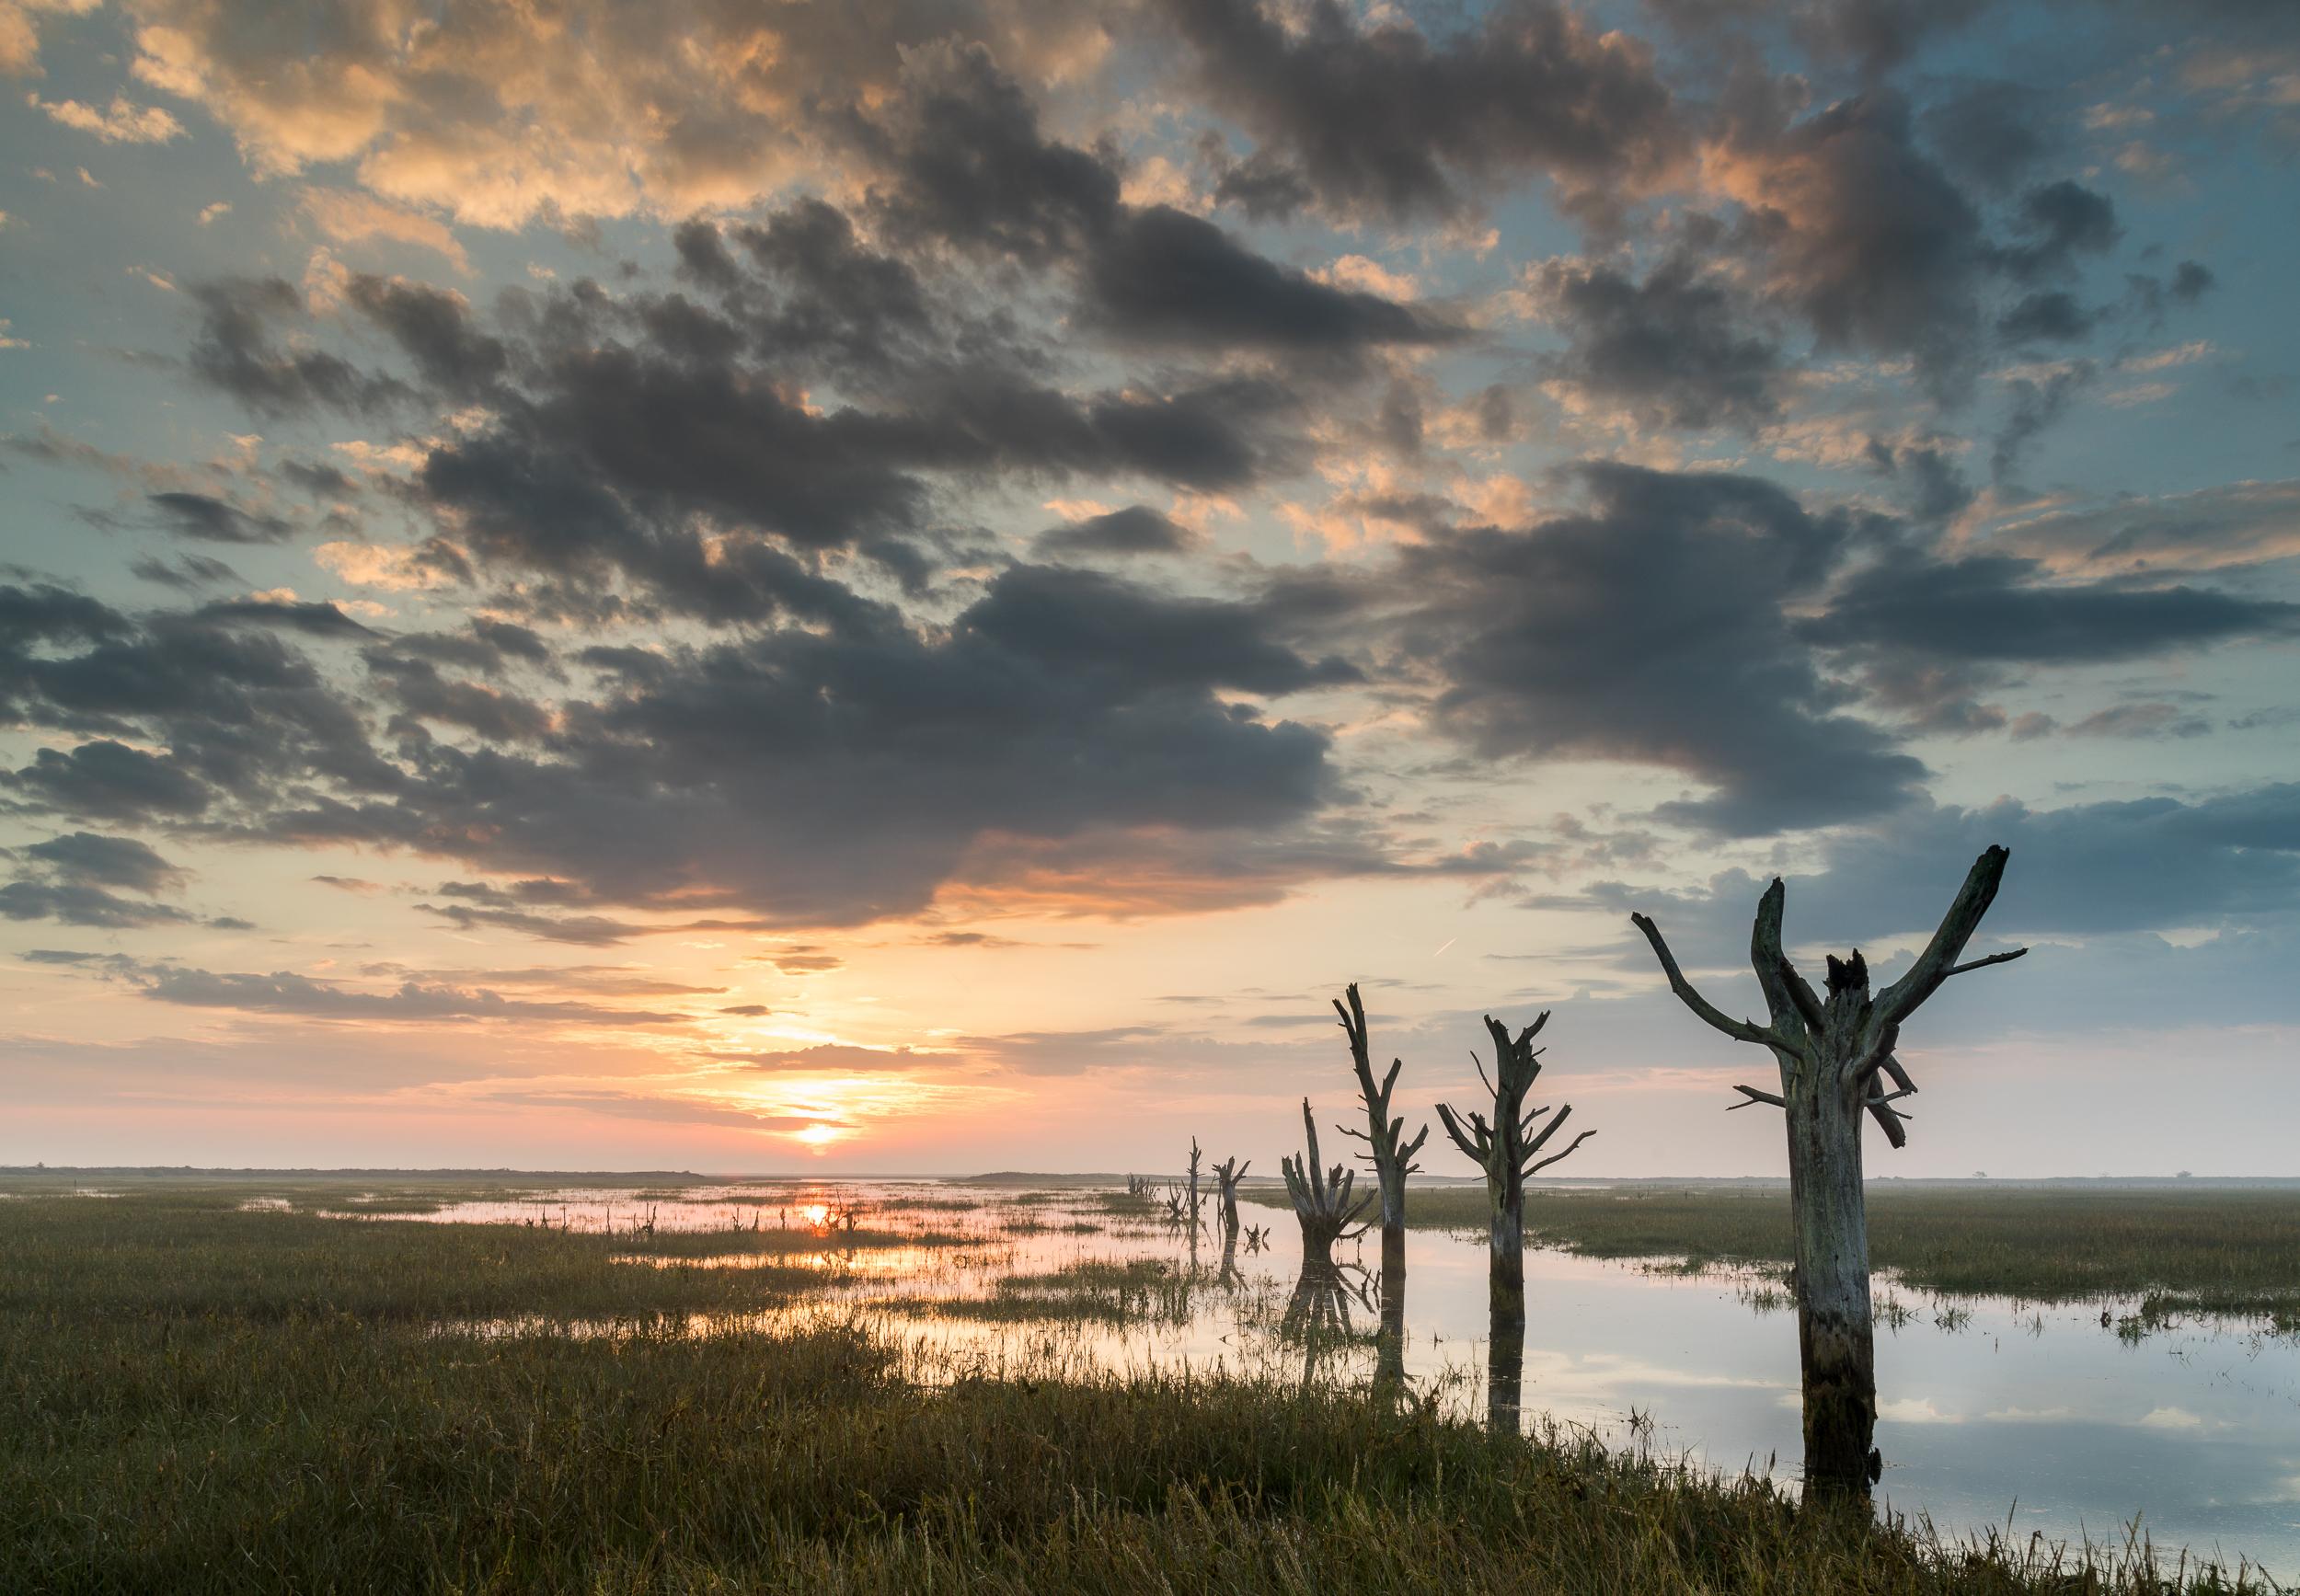 Sunrise on the Essex coast. Canon 5D mkIV, 16-35mm @ 20mm, 1.3sec, f16, ISO 100, Lee 0.9 reverse ND grad